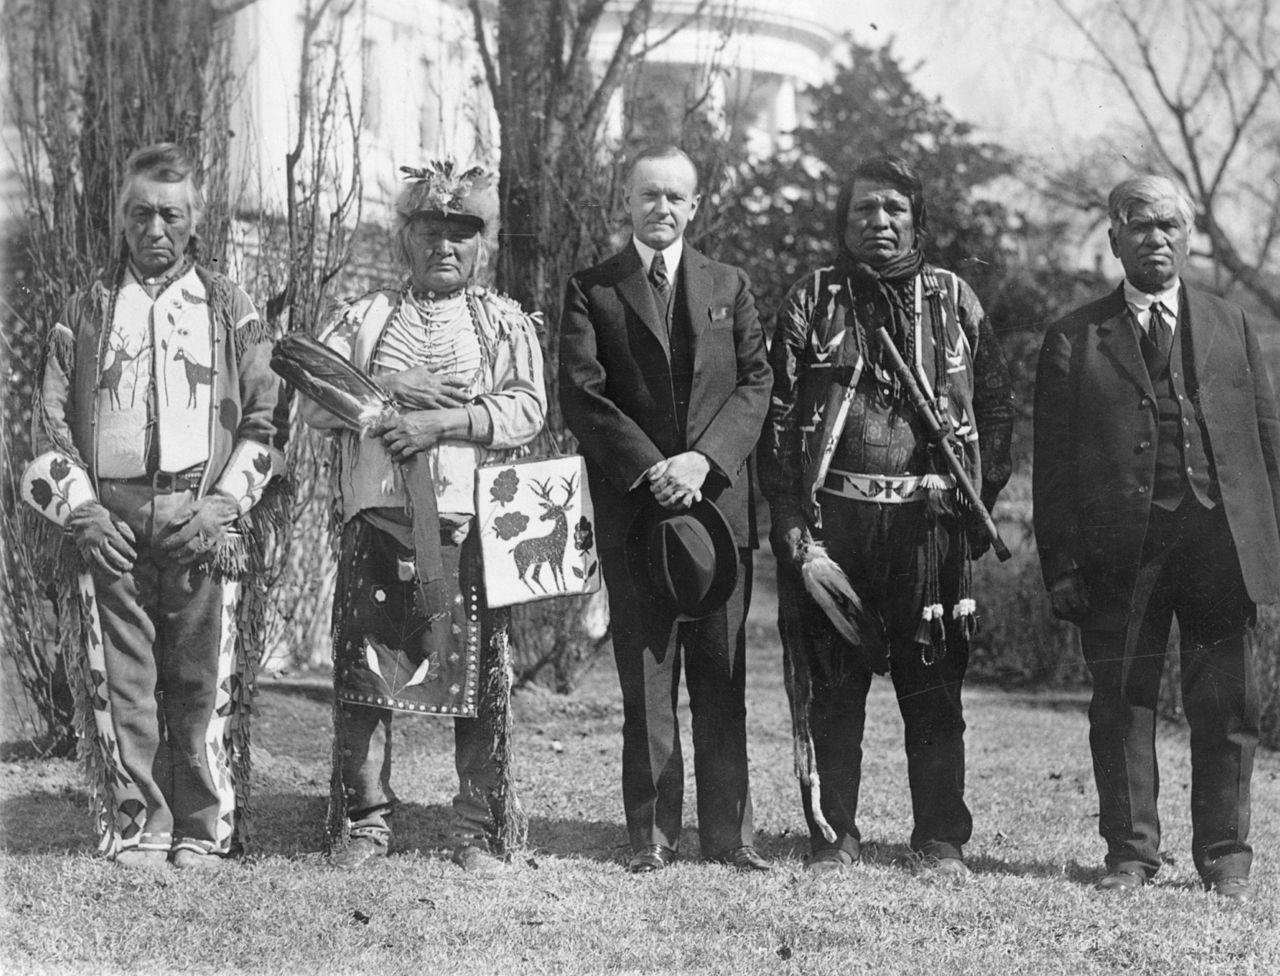 Calvin Coolidge, 30e président des Etats-Unis (2 août 1923 – 4 mars 1929) avec des membres de la tribu des Osages lors de la signature de l'Indian Citizenship Act, National Photo Company, Library of Congress, 1924.